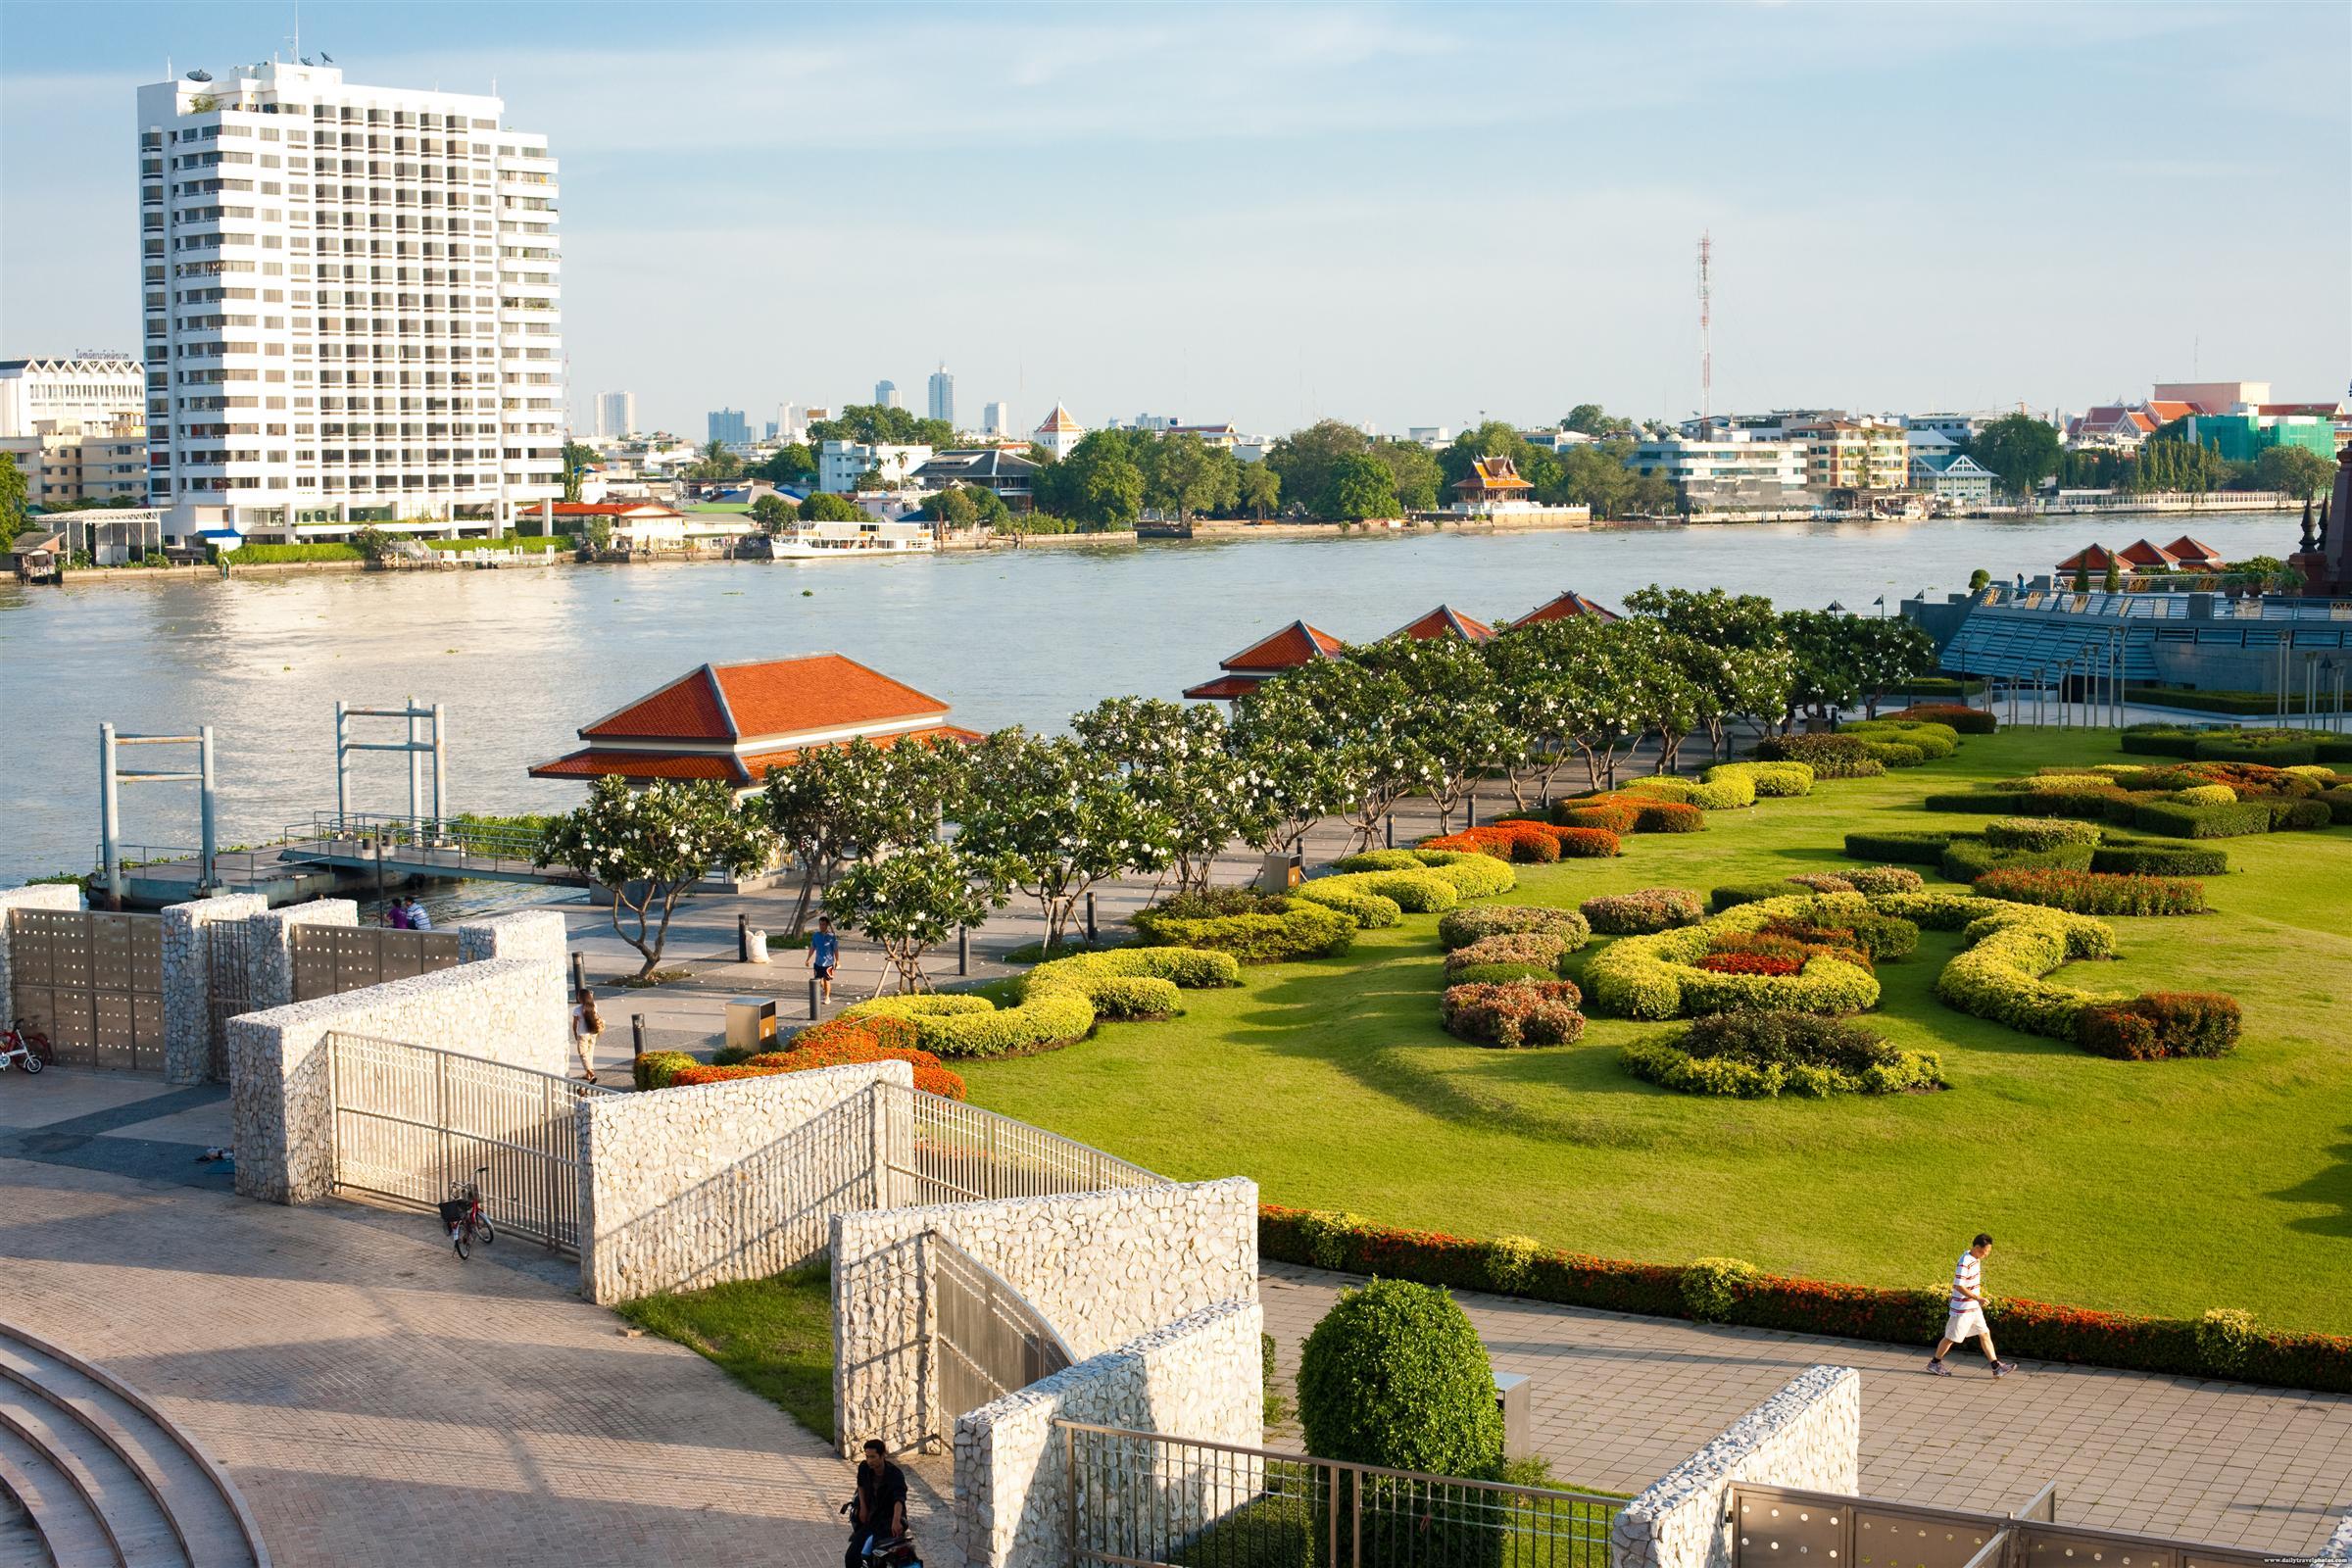 Rama VIII Park and Chao Phraya River - Bangkok, Thailand - Daily Travel Photos